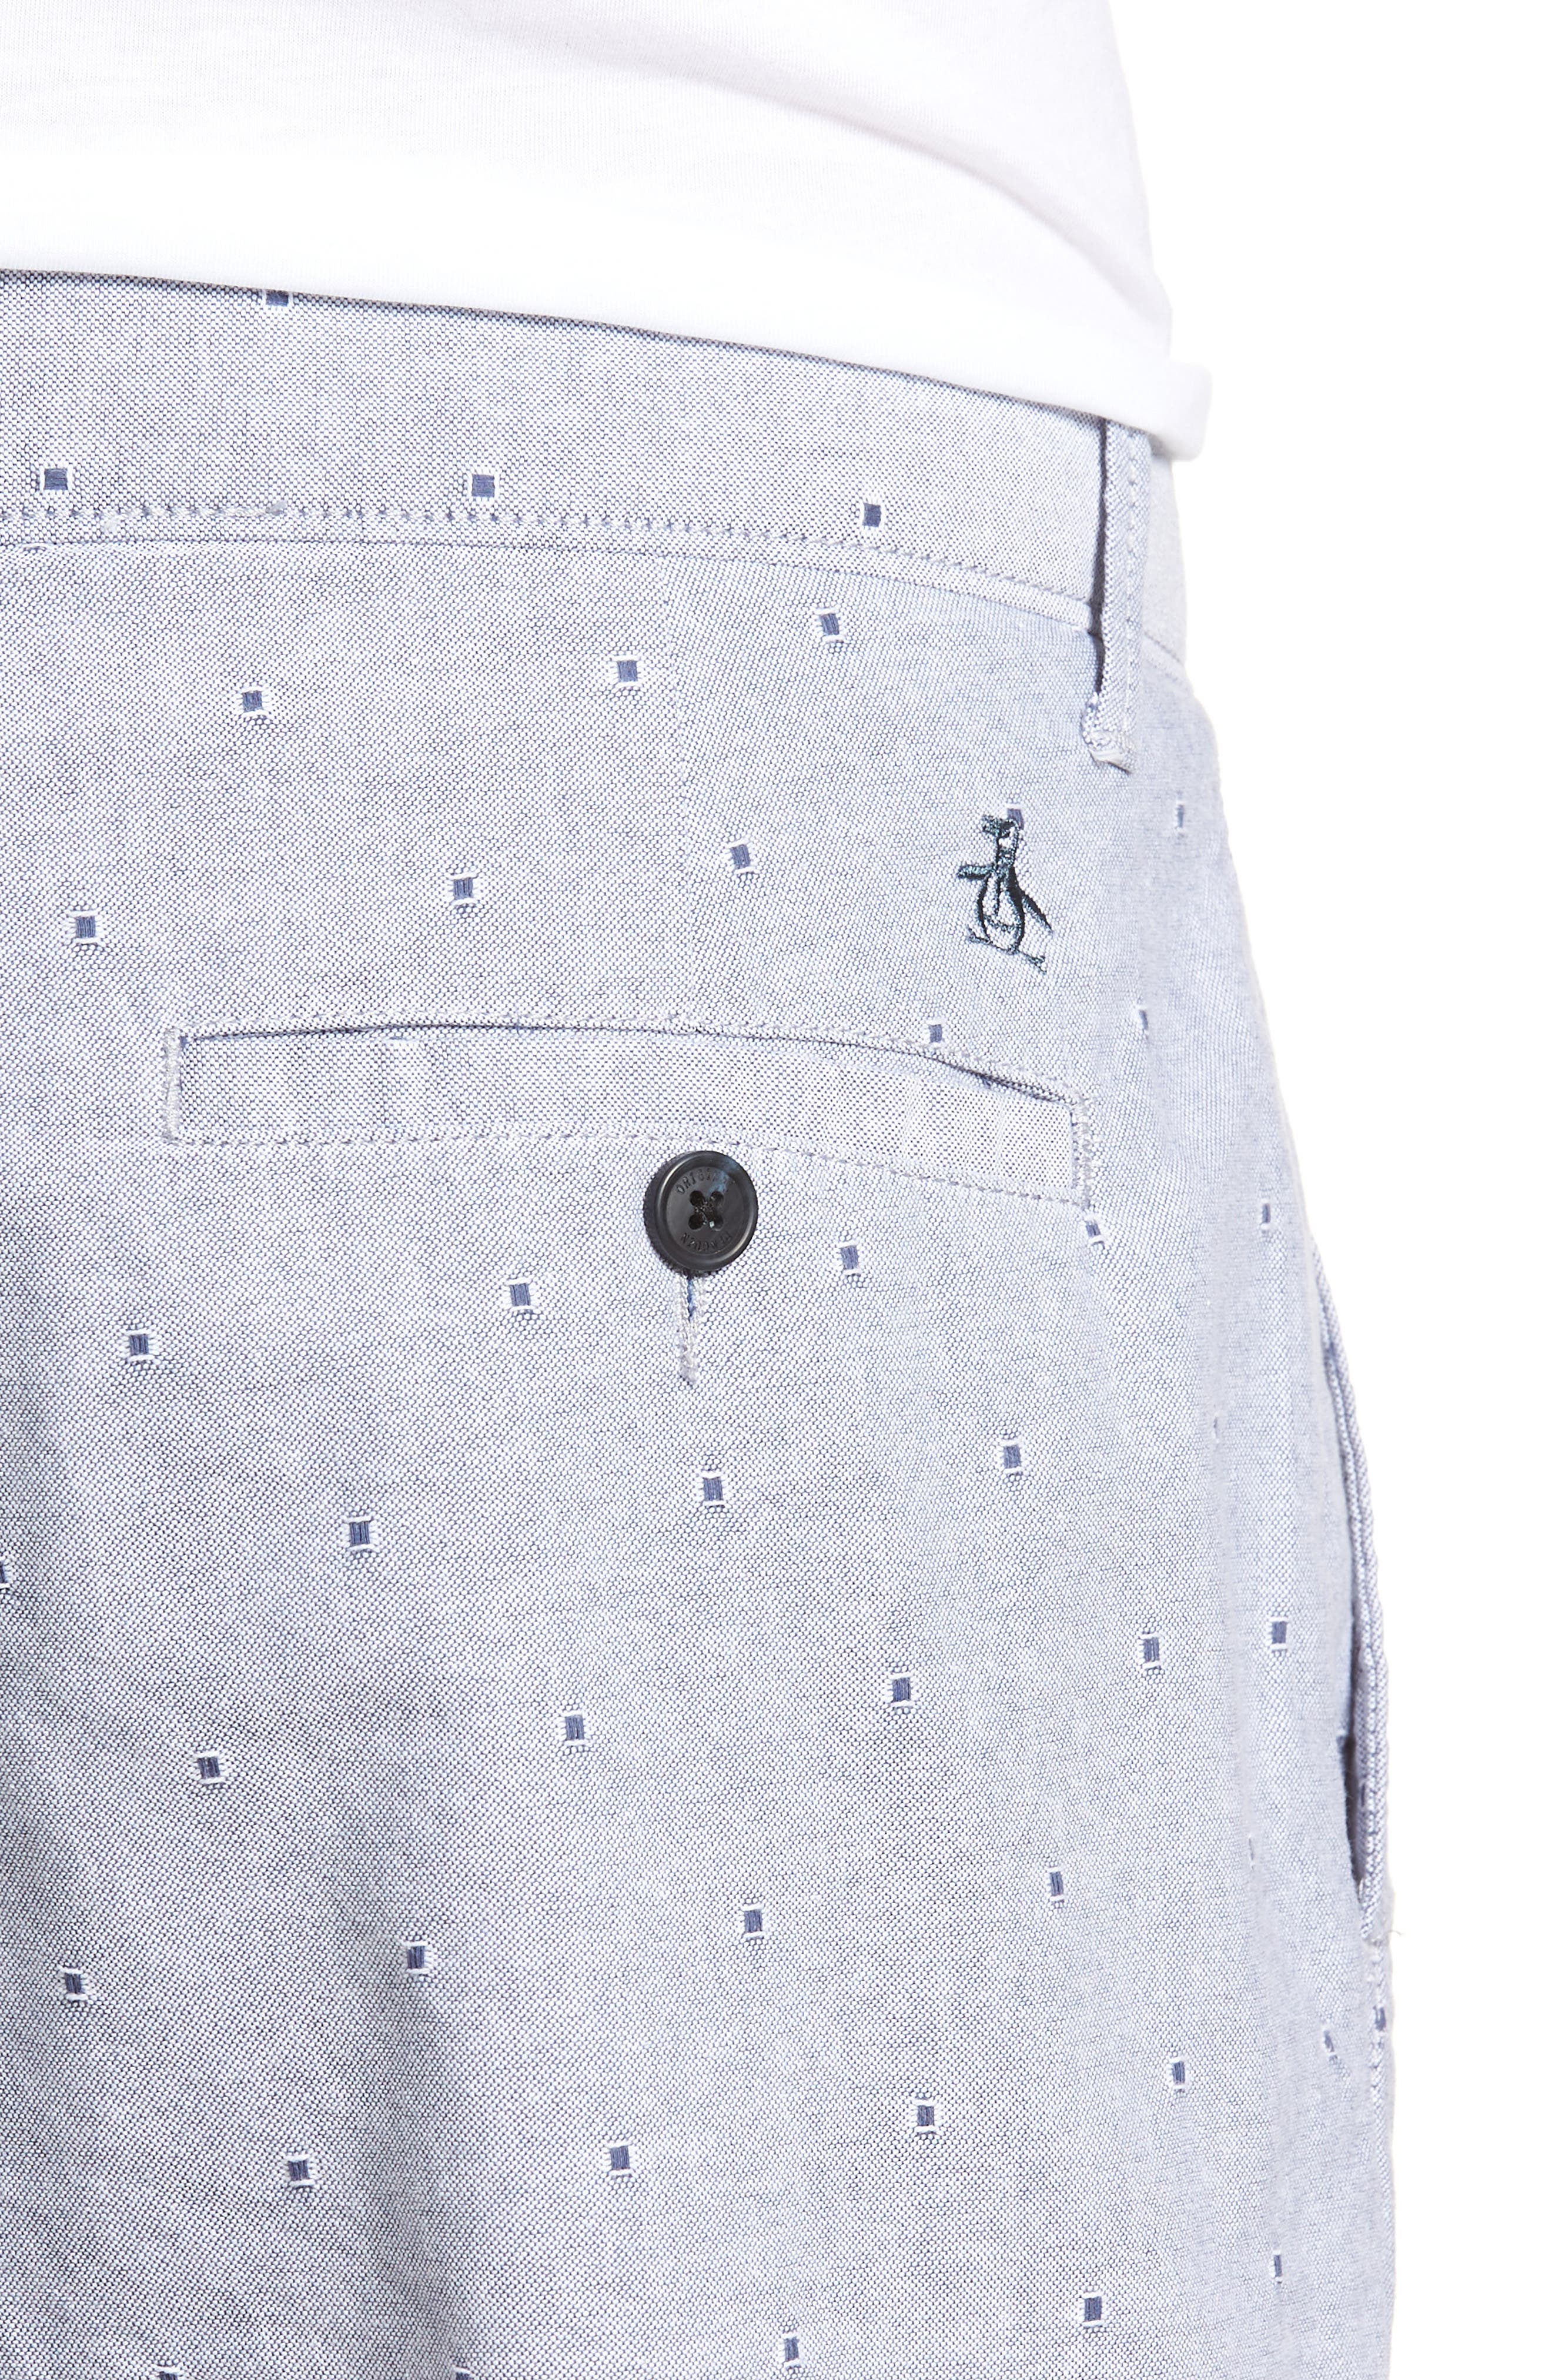 Dobby Dot Slim Fit Oxford Shorts,                             Alternate thumbnail 6, color,